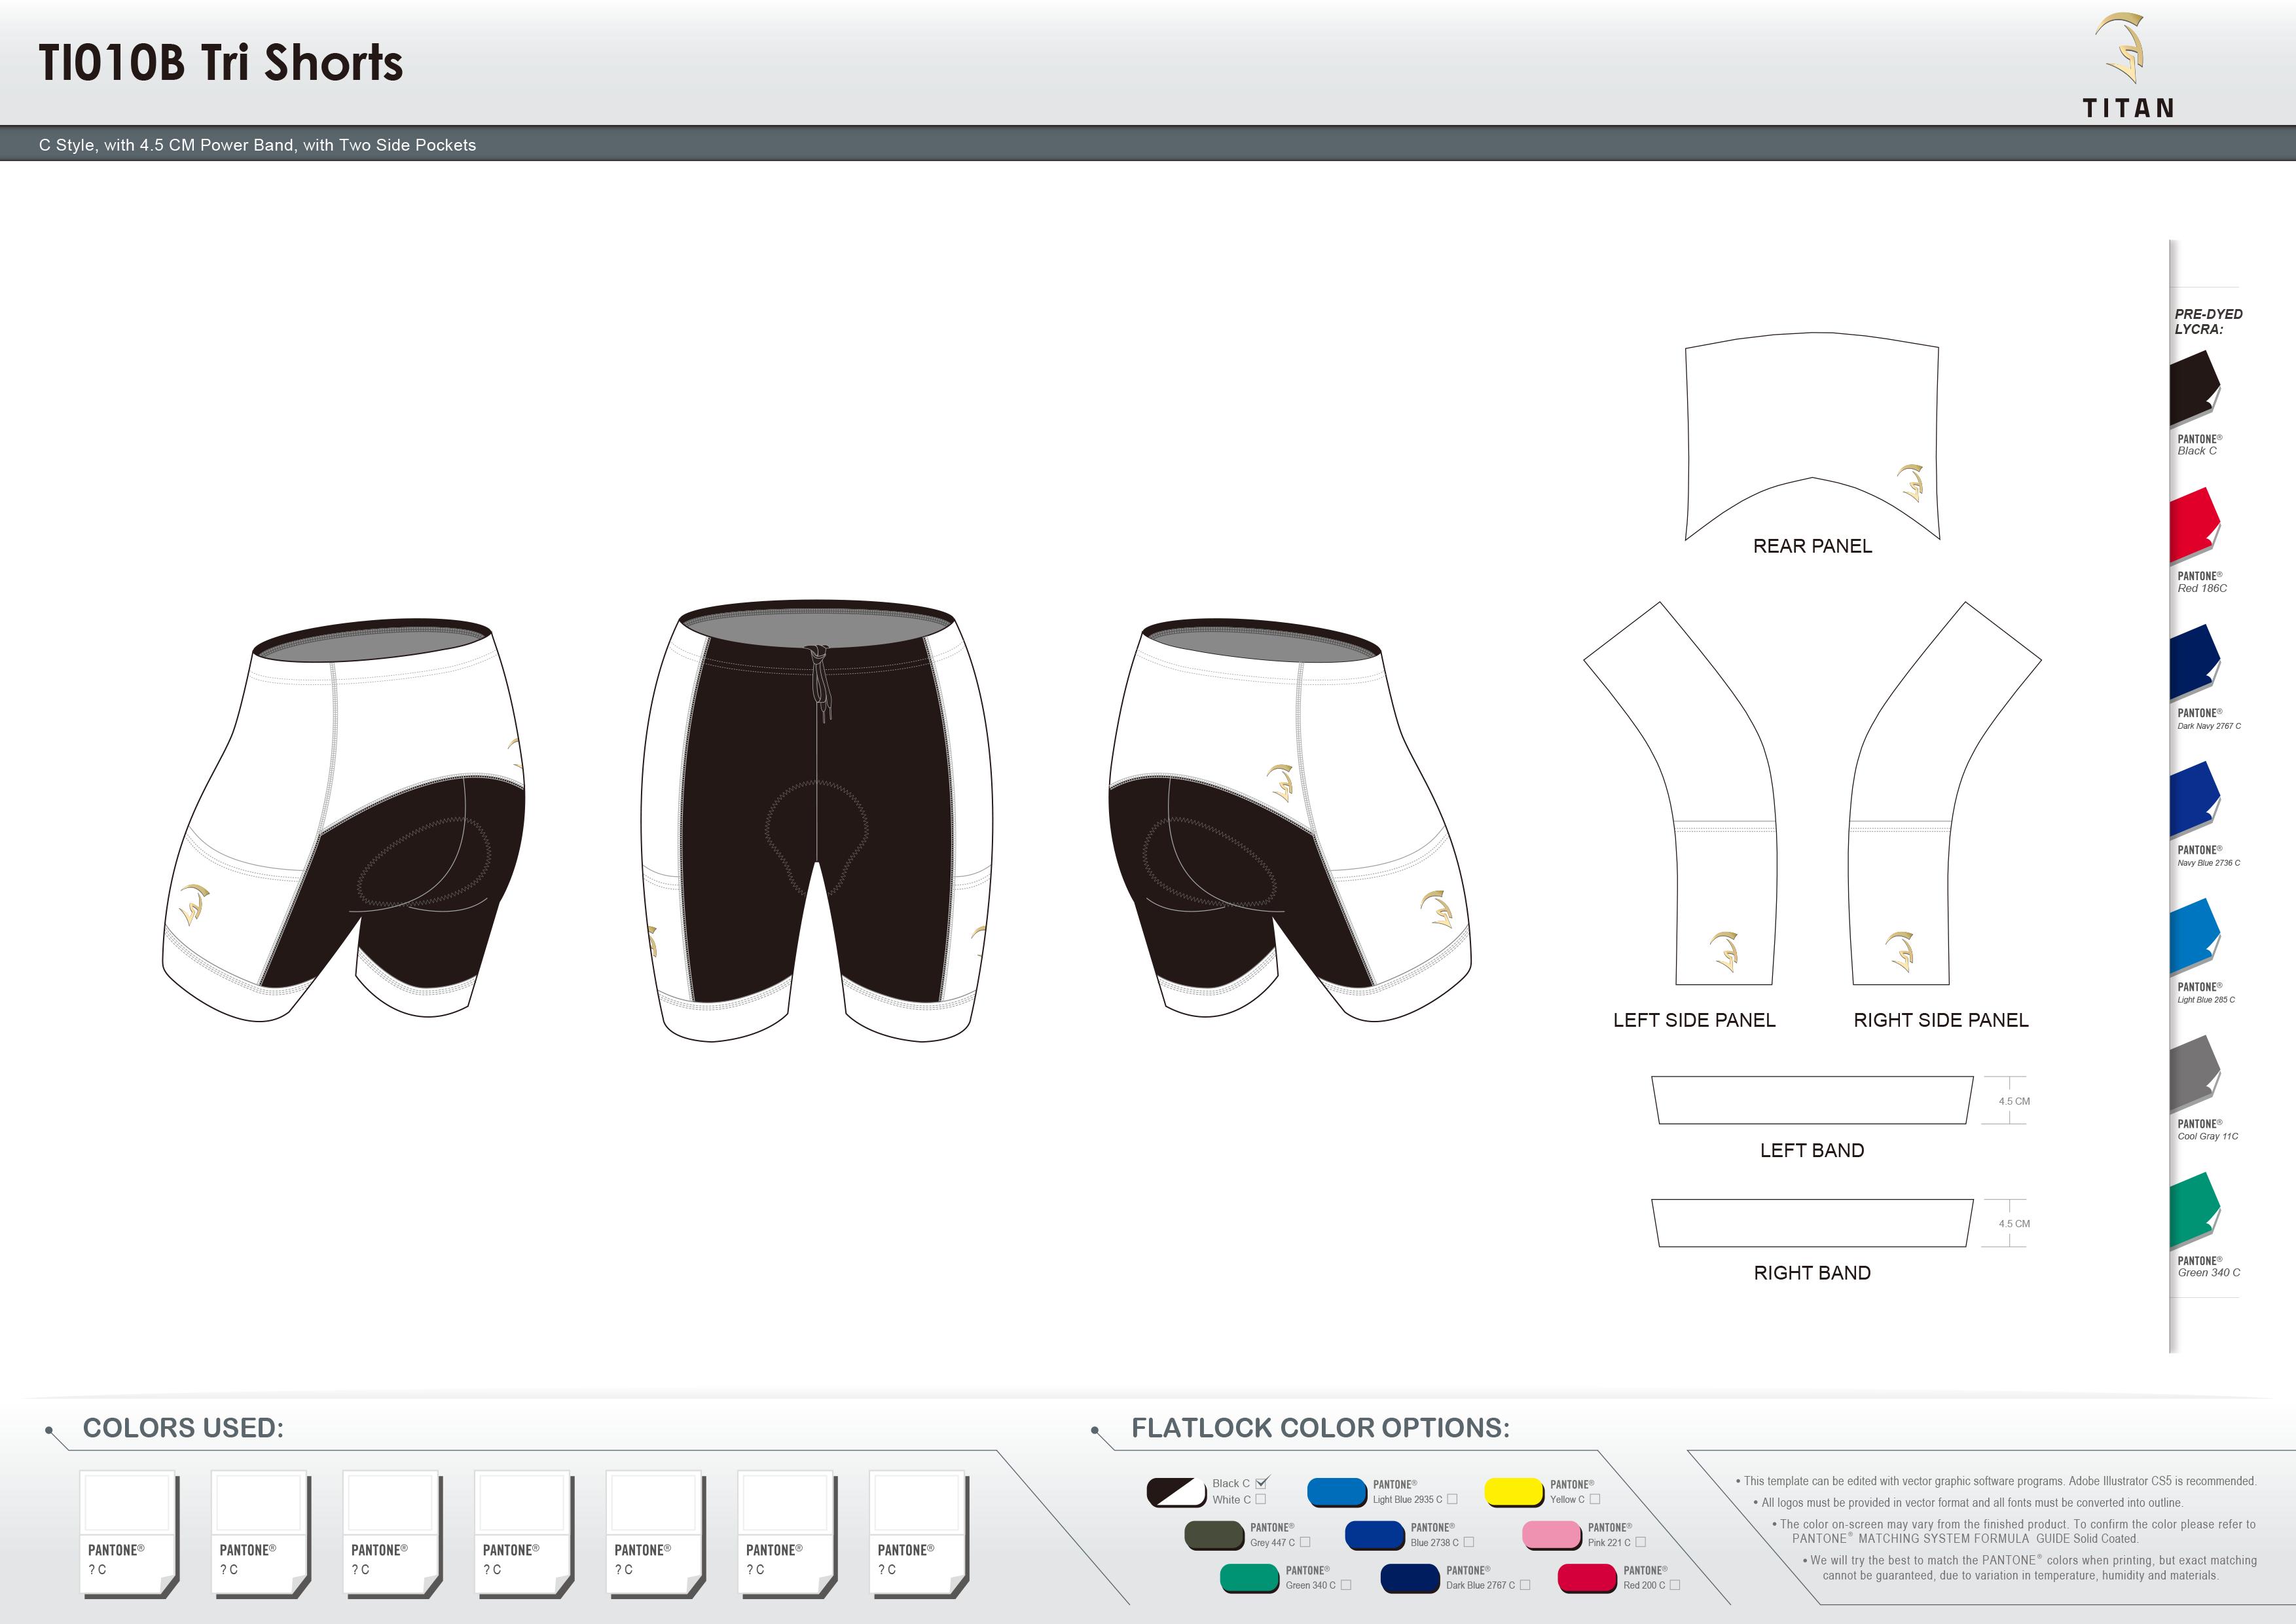 TI010B Tri Shorts with 2 Side Pockets